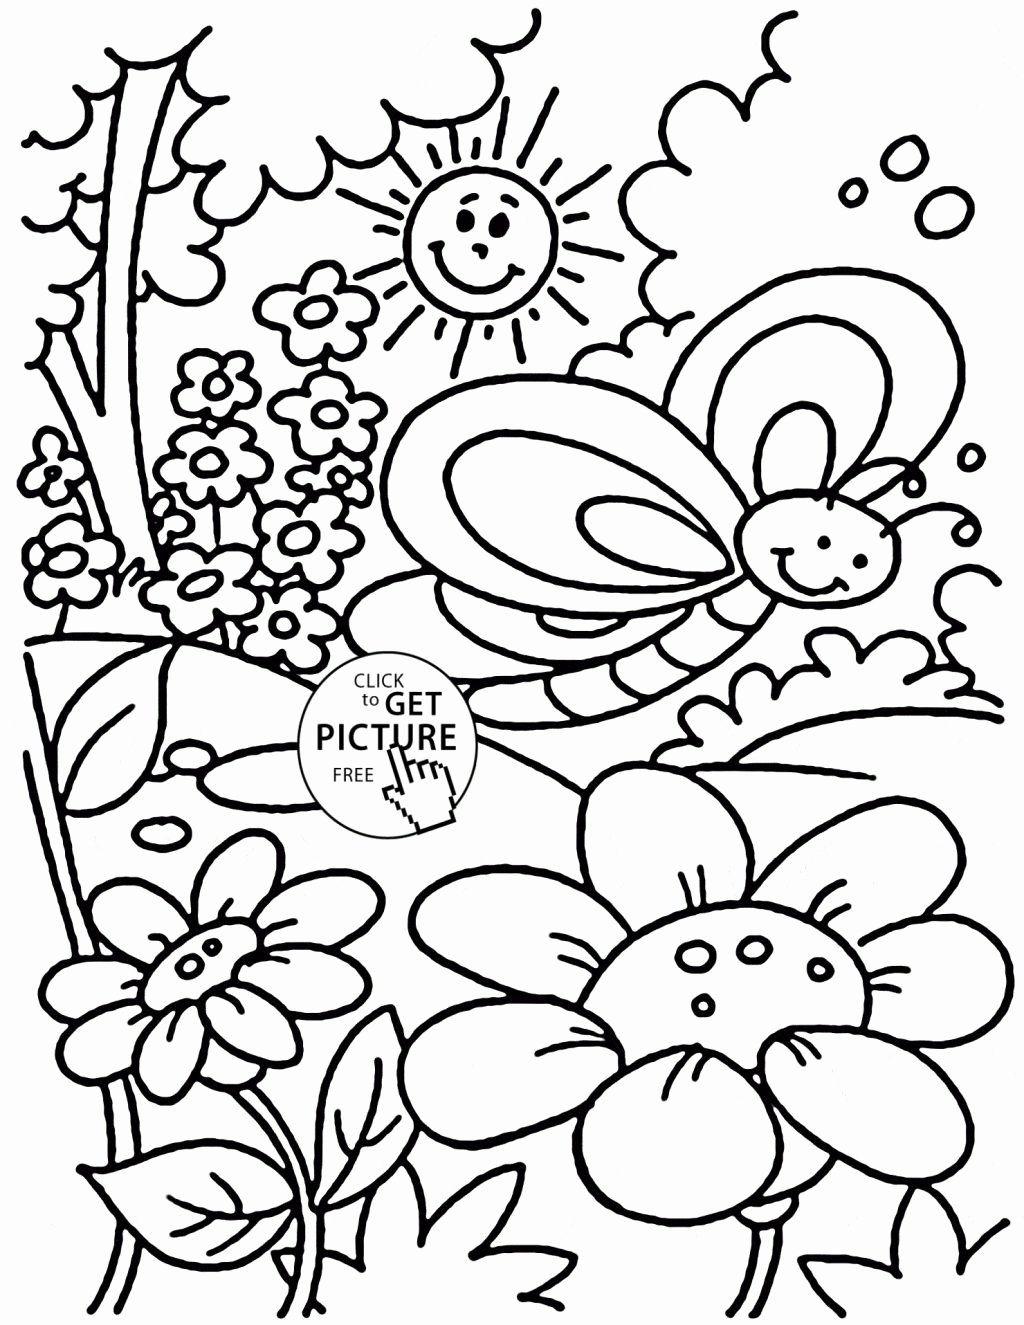 Free Spring Printable Coloring Pages New Coloring Arts 50 Excelent Free Printable Spring Coloring Buku Mewarnai Lembar Mewarnai Halaman Mewarnai